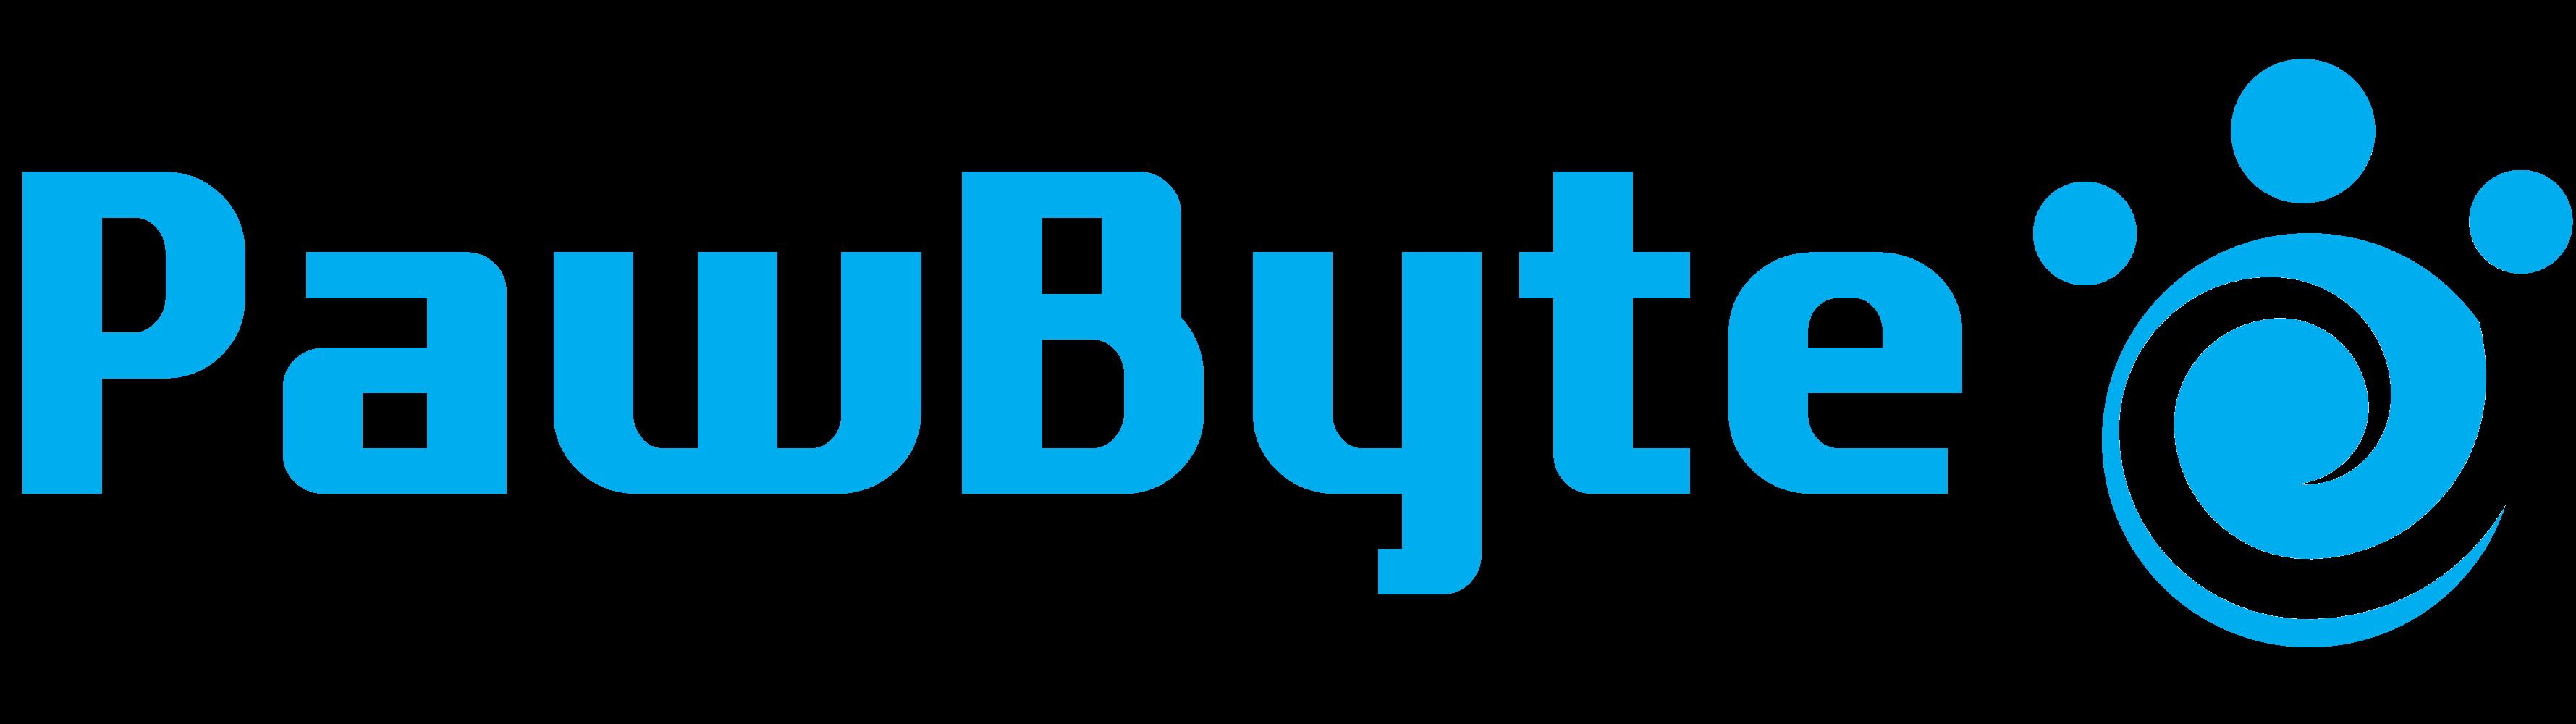 Pawbyte LLC